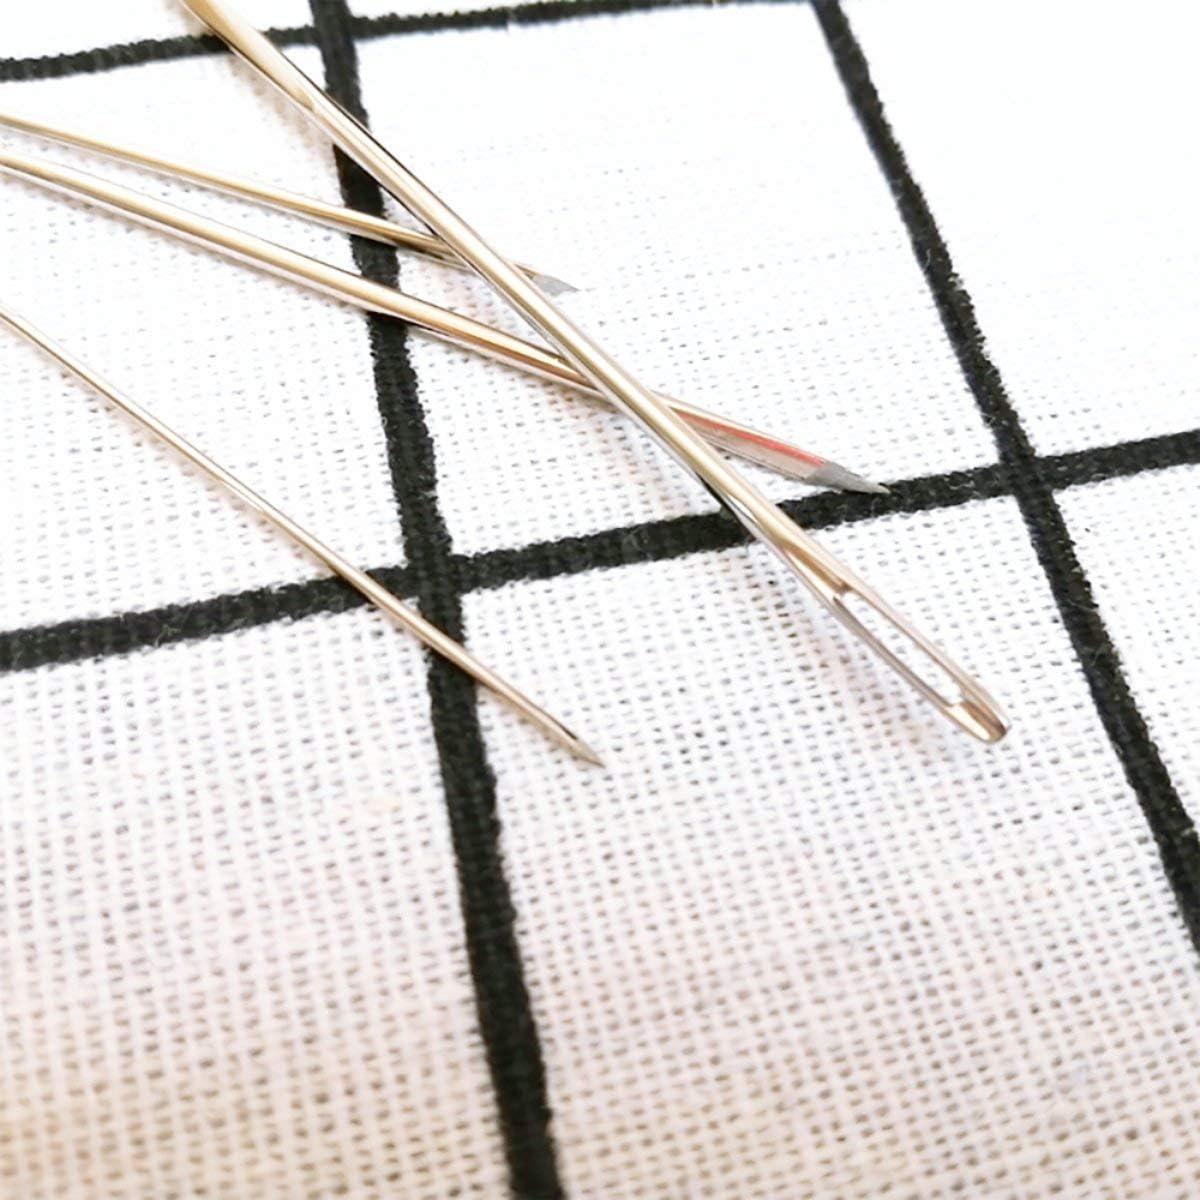 Greatangle C01-006-00066 Agujas de ojo grande Aguja de coser de cuero Aguja Tapiz de bordado Accesorios de costura a mano